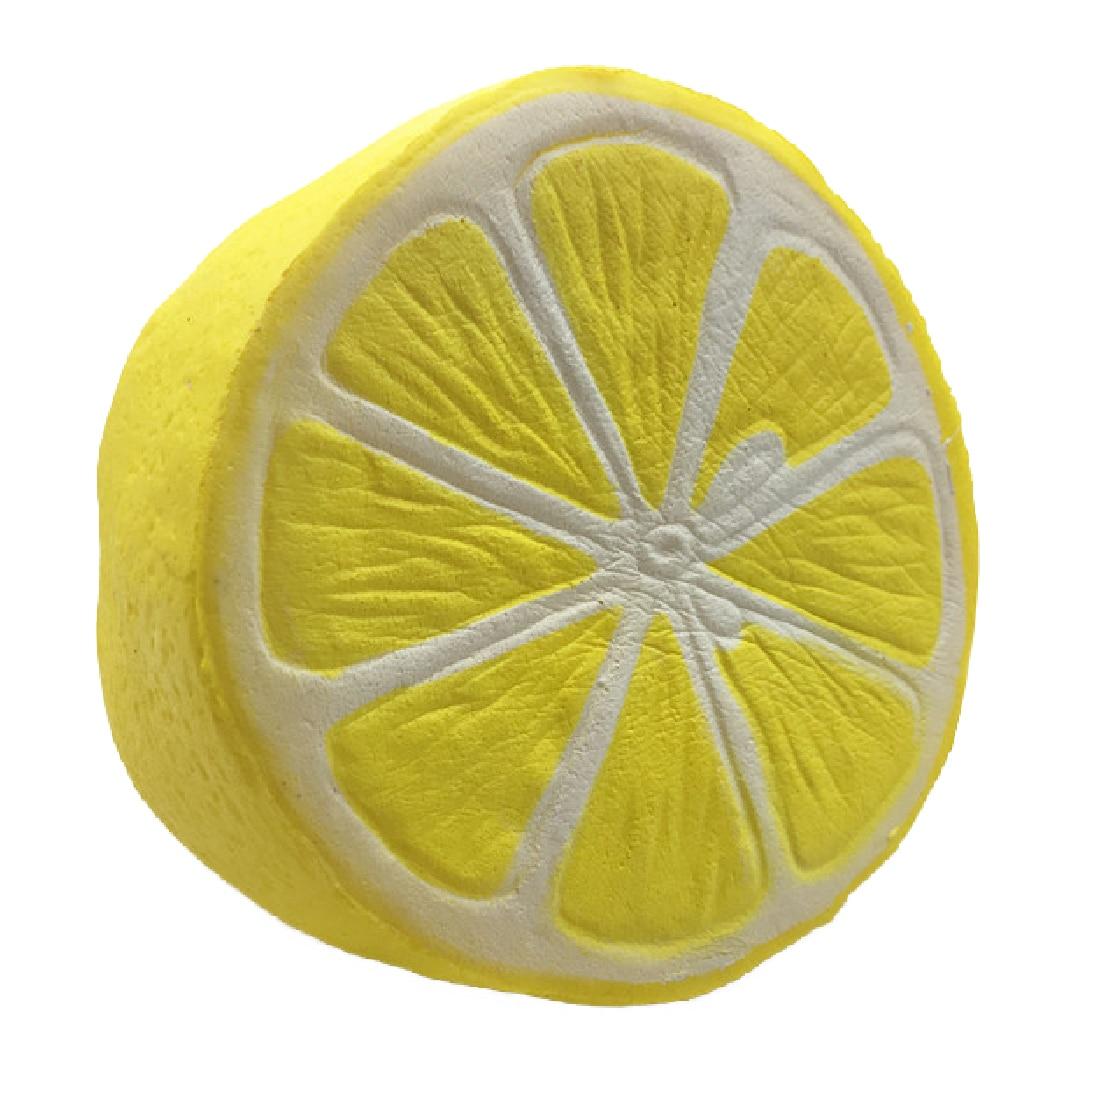 Etmakit Cute 11CM Jumbo Squishy Lemon Kawaii Squishy Fruit Slow Rising Decoration Phone Strap Pendant Squishes Gift Toys Doll